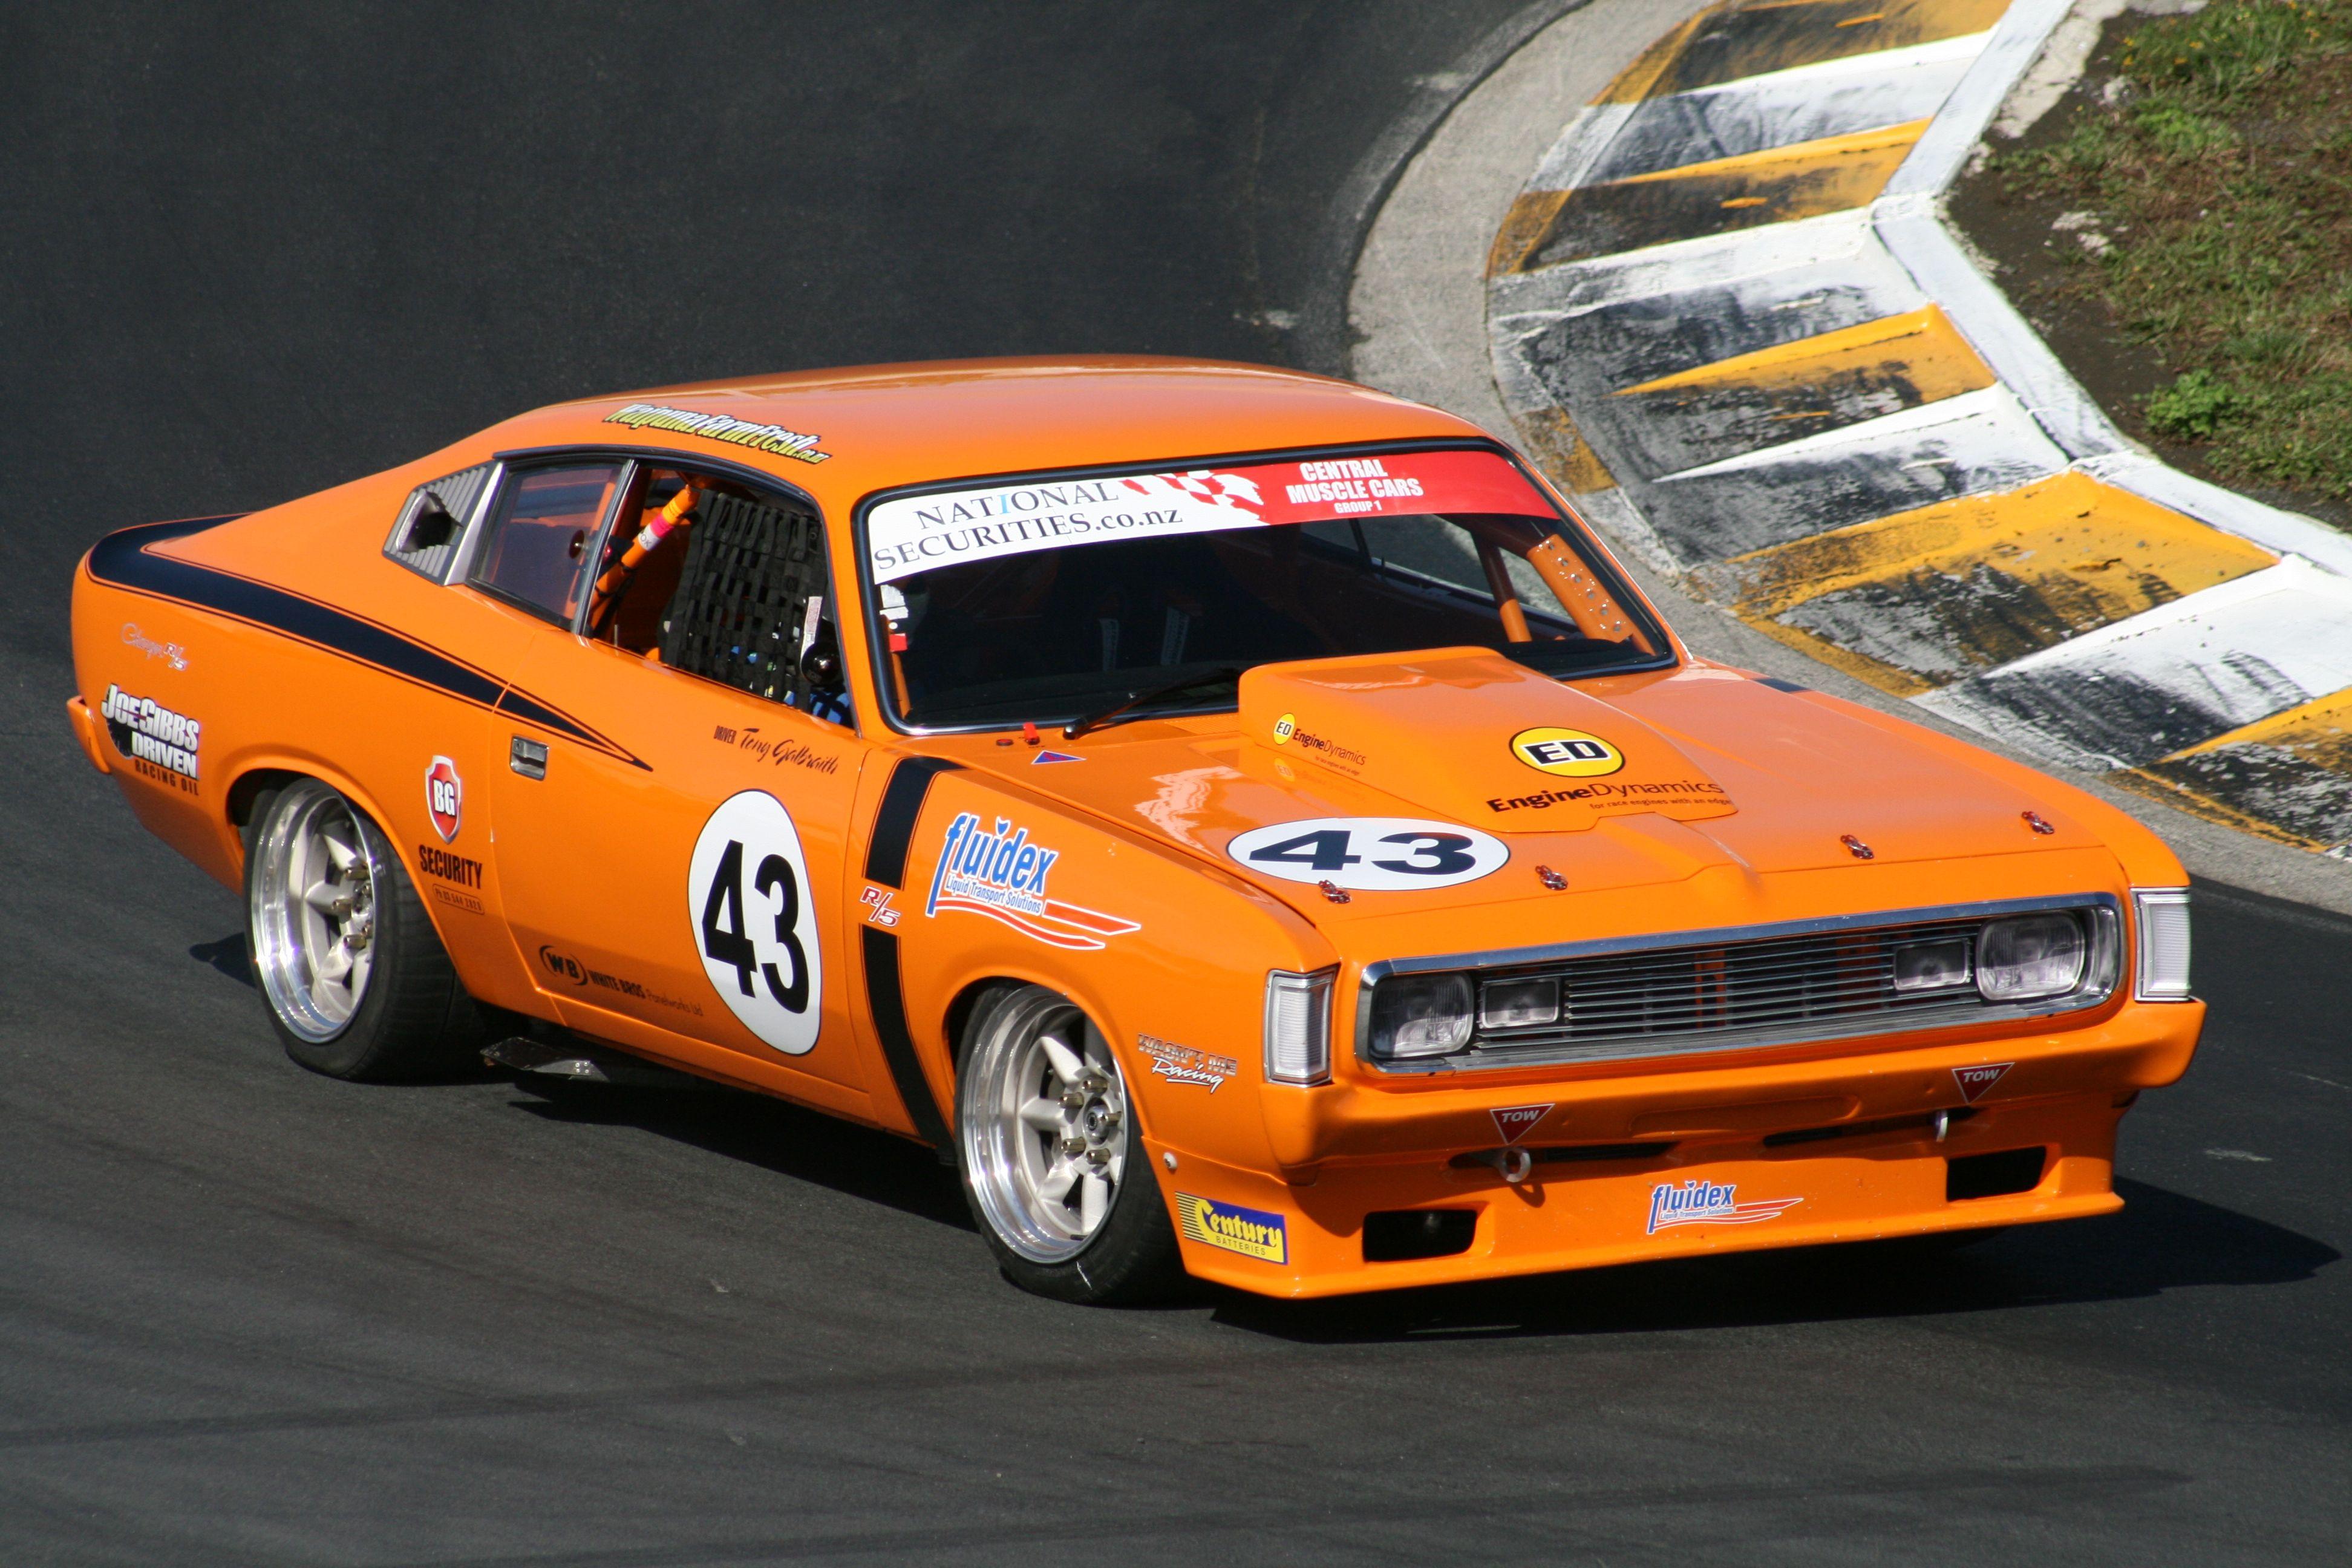 Tony Gailbrath in his Vailant Charger racing at Hampton